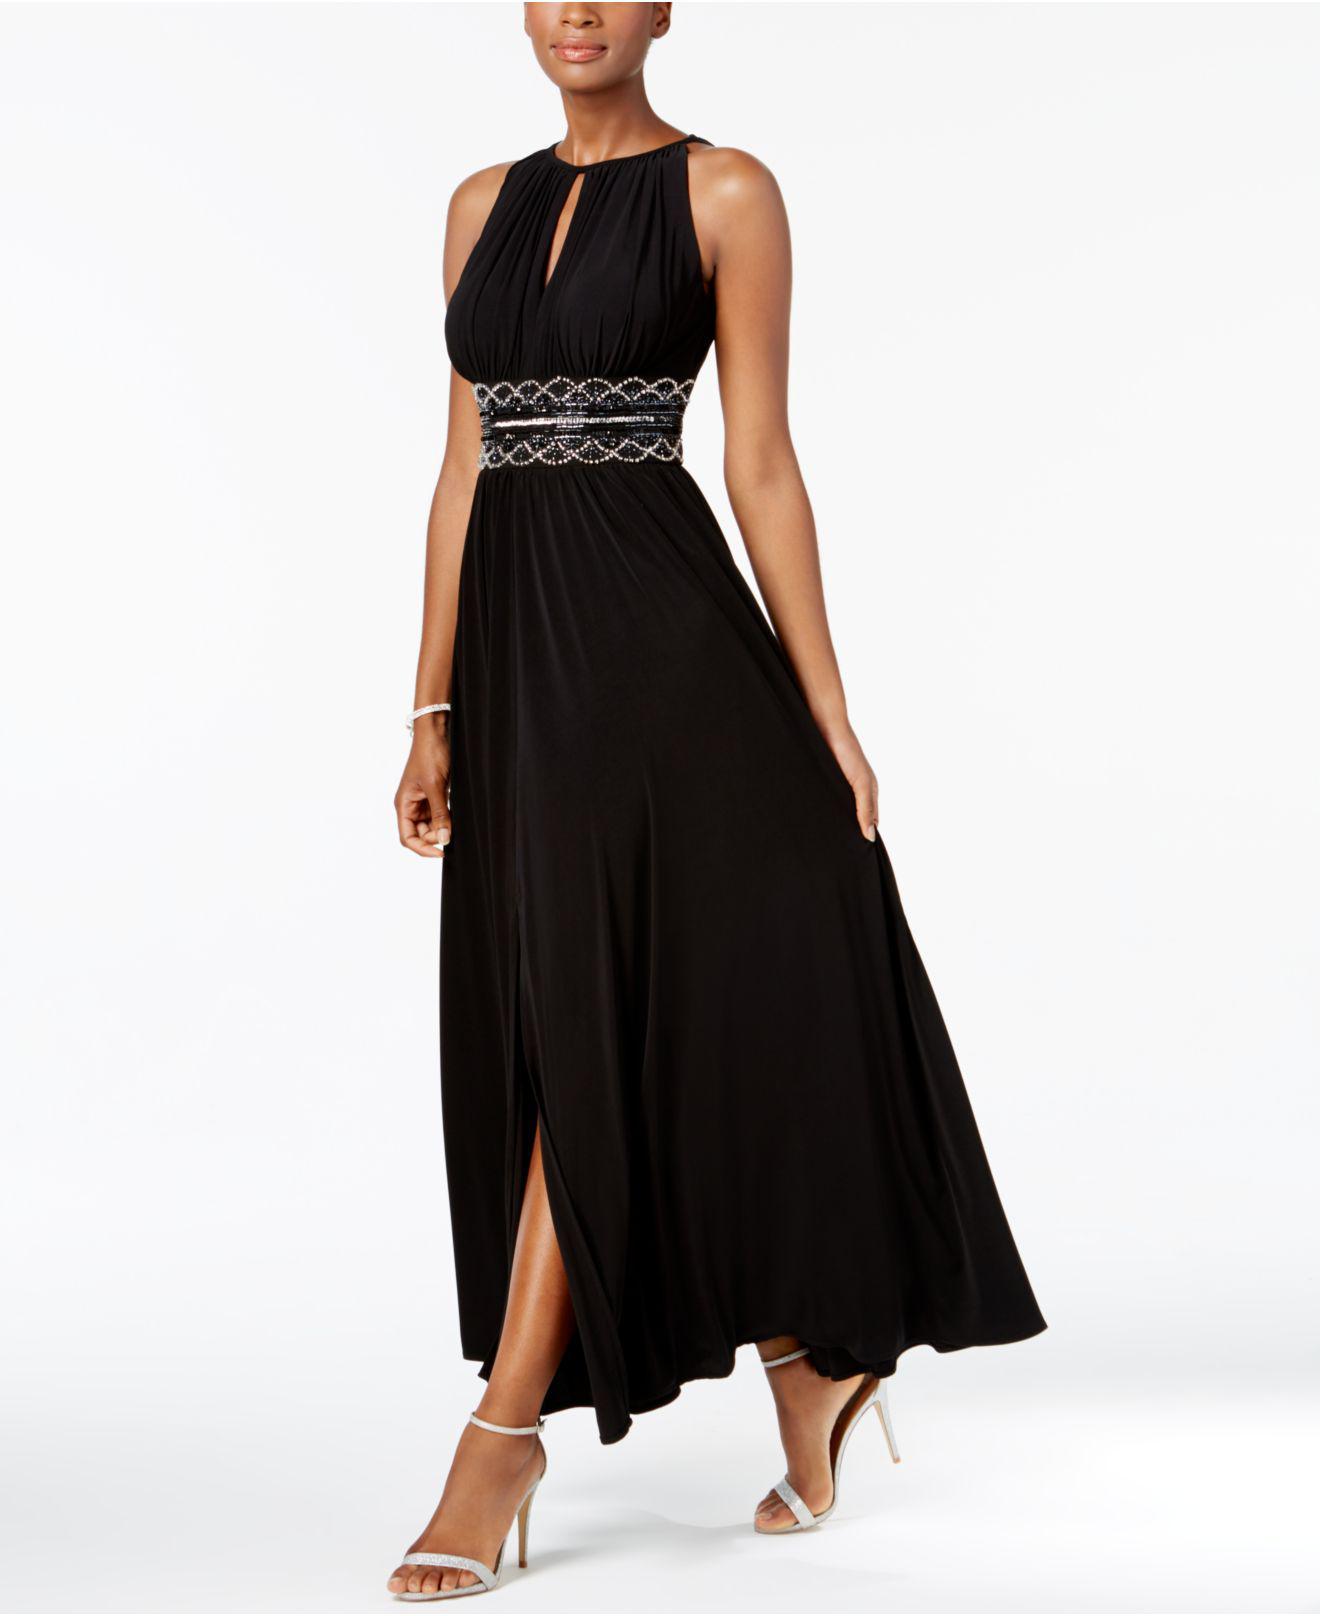 b1dca657ab218 R   M Richards. Women s Black Dress